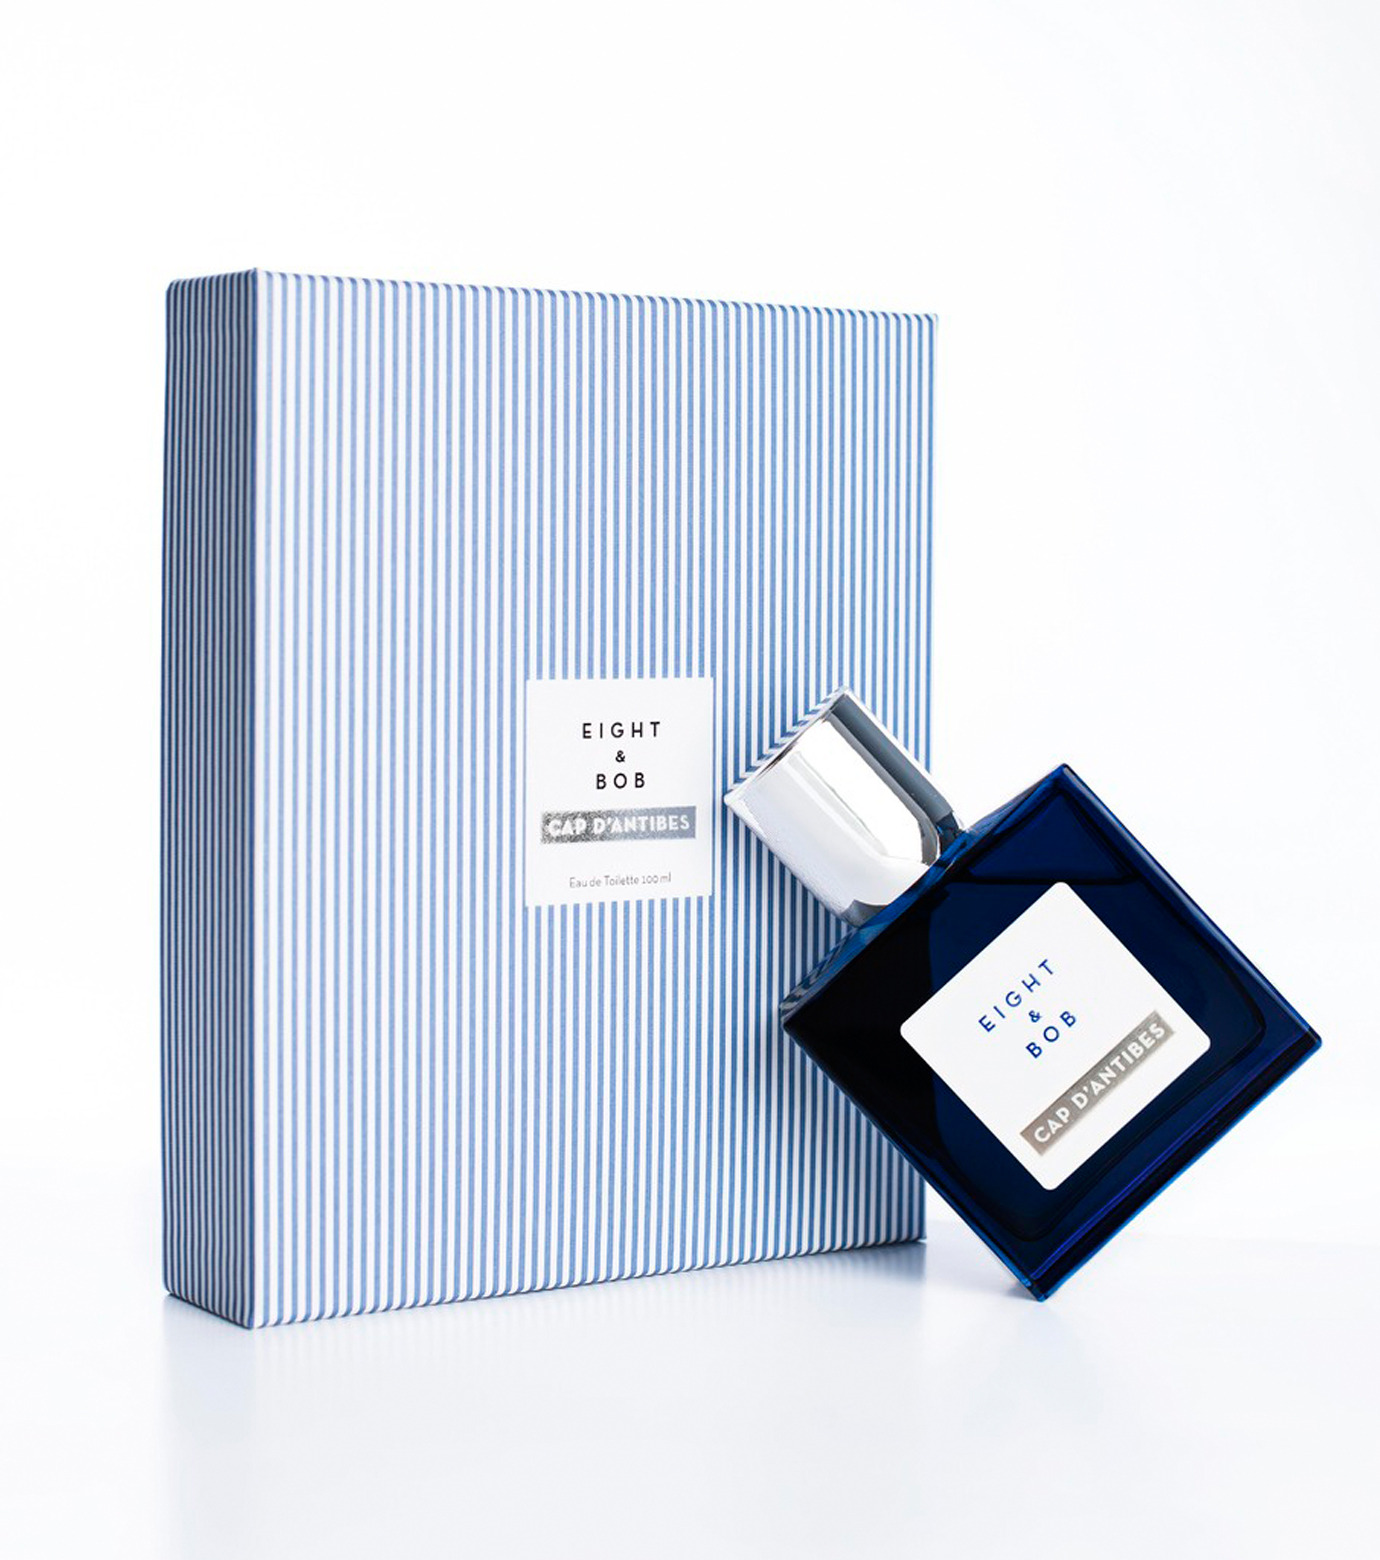 EIGHT&BOB(エイト&ボブ)のCAP D'ANTIBES eau de parfum-NAVY(フレグランス/fragrance)-101FR-CD1024-93 拡大詳細画像2